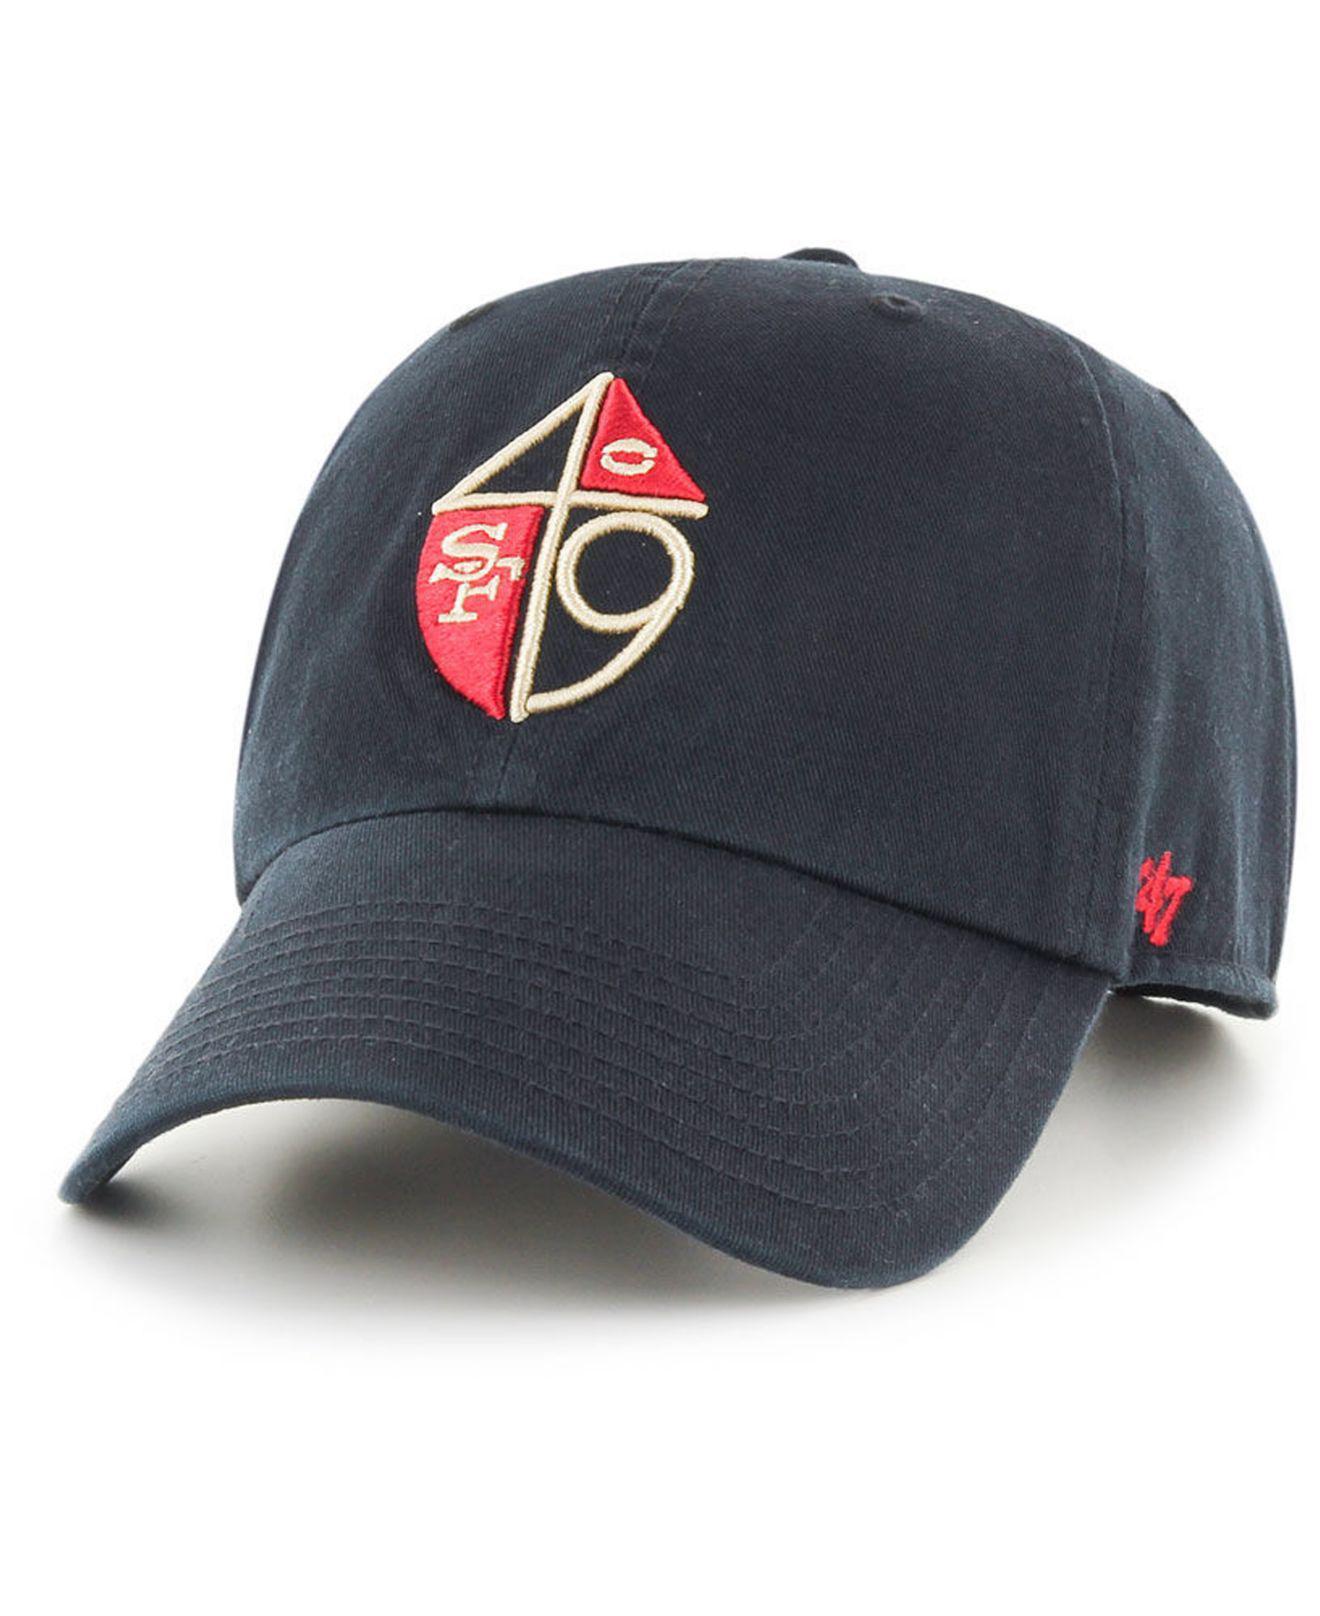 Lyst - 47 Brand San Francisco 49ers Clean Up Strapback Cap in Black ... 531fe561fd12